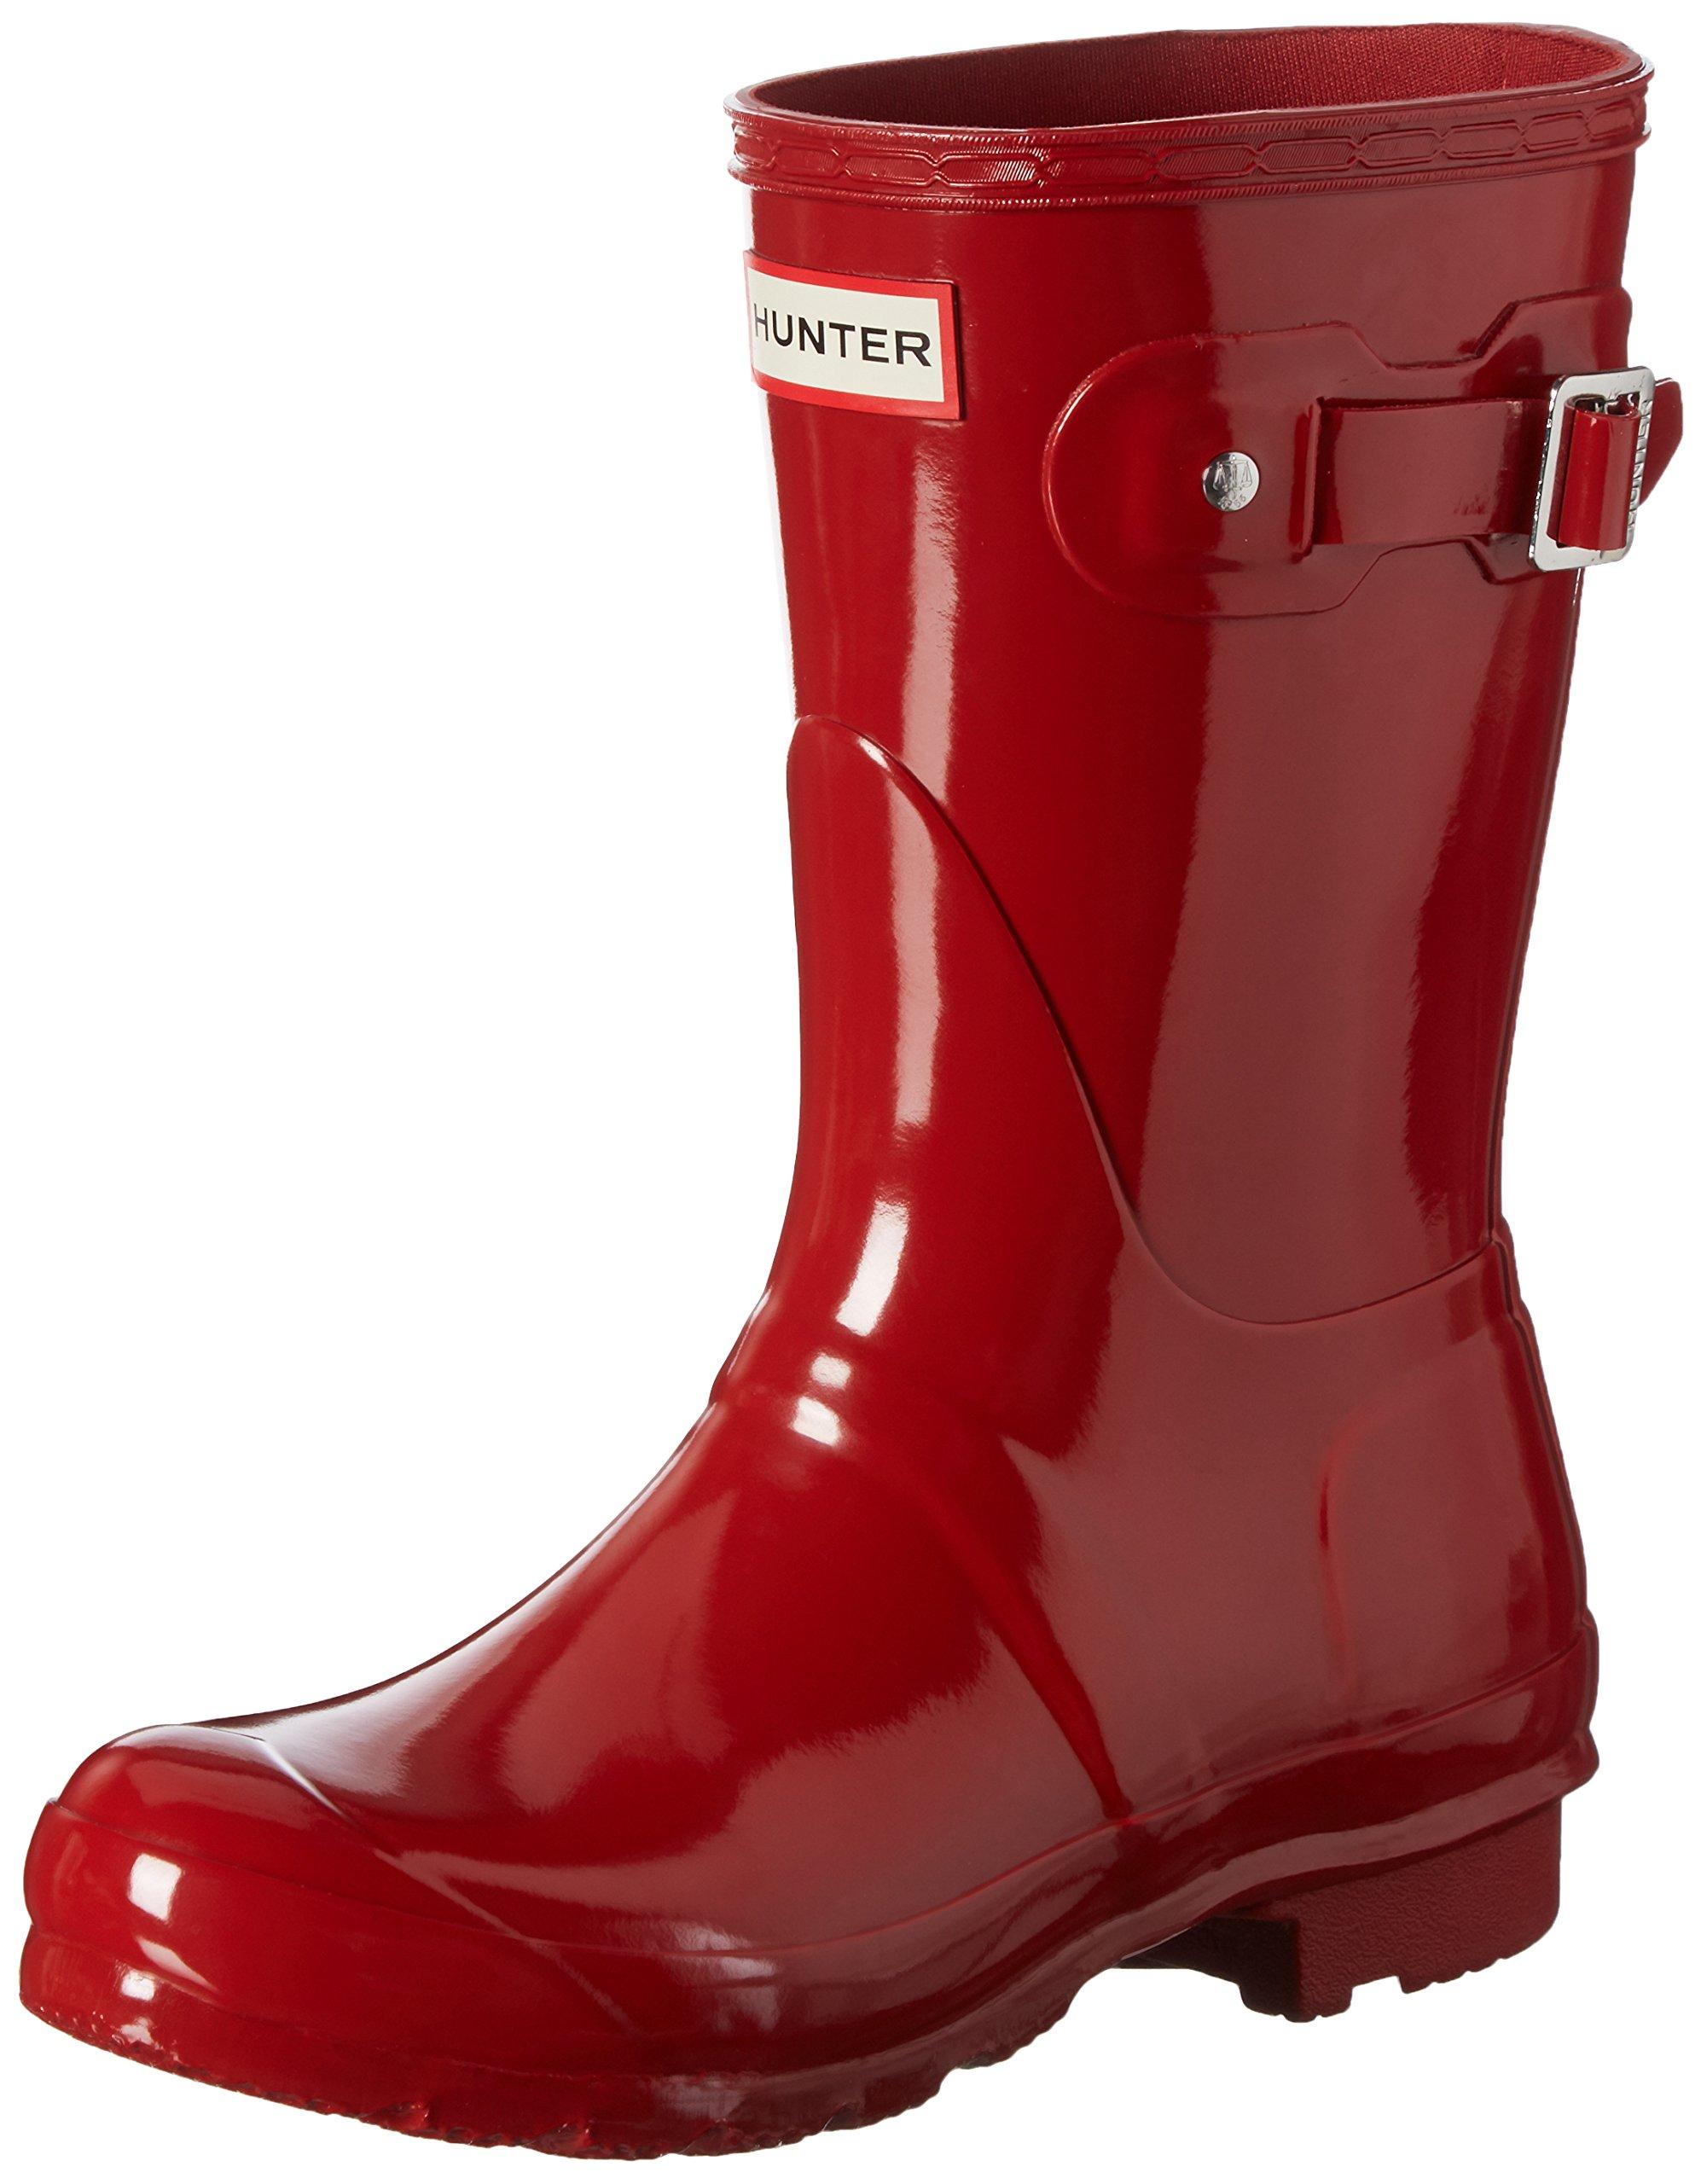 Hunter-WFS1000RGL-Women-039-s-Original-Short-Gloss-Boots-All-Colors thumbnail 27